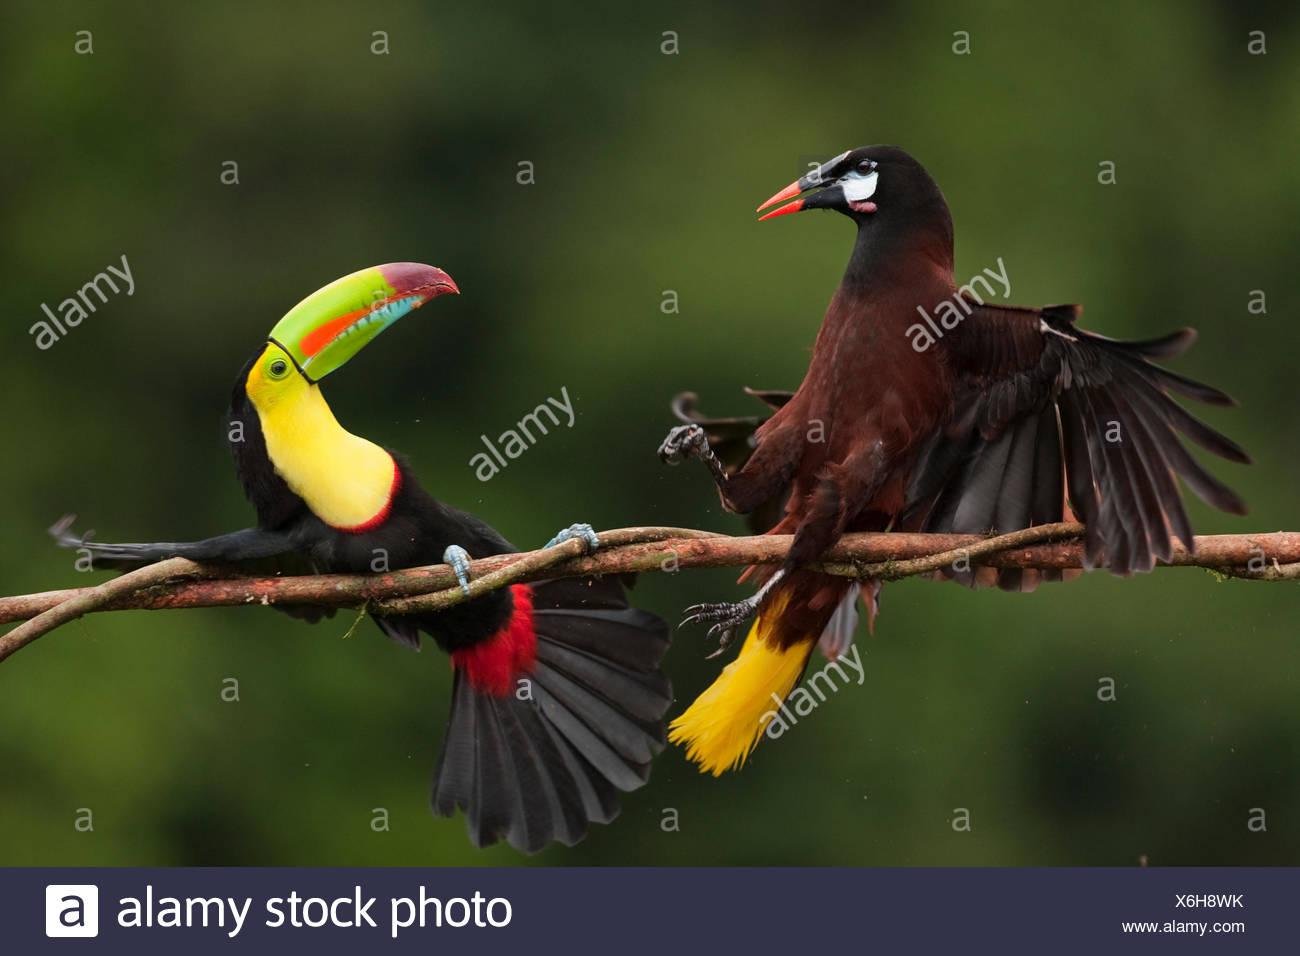 Keel-billed Toucan (Ramphastos sulfuratus) in aggressive encounter with a Montezuma Oropendola (Psarocolius montezuma), Laguna del Lagarto, Santa Rita, Costa Rica - Stock Image